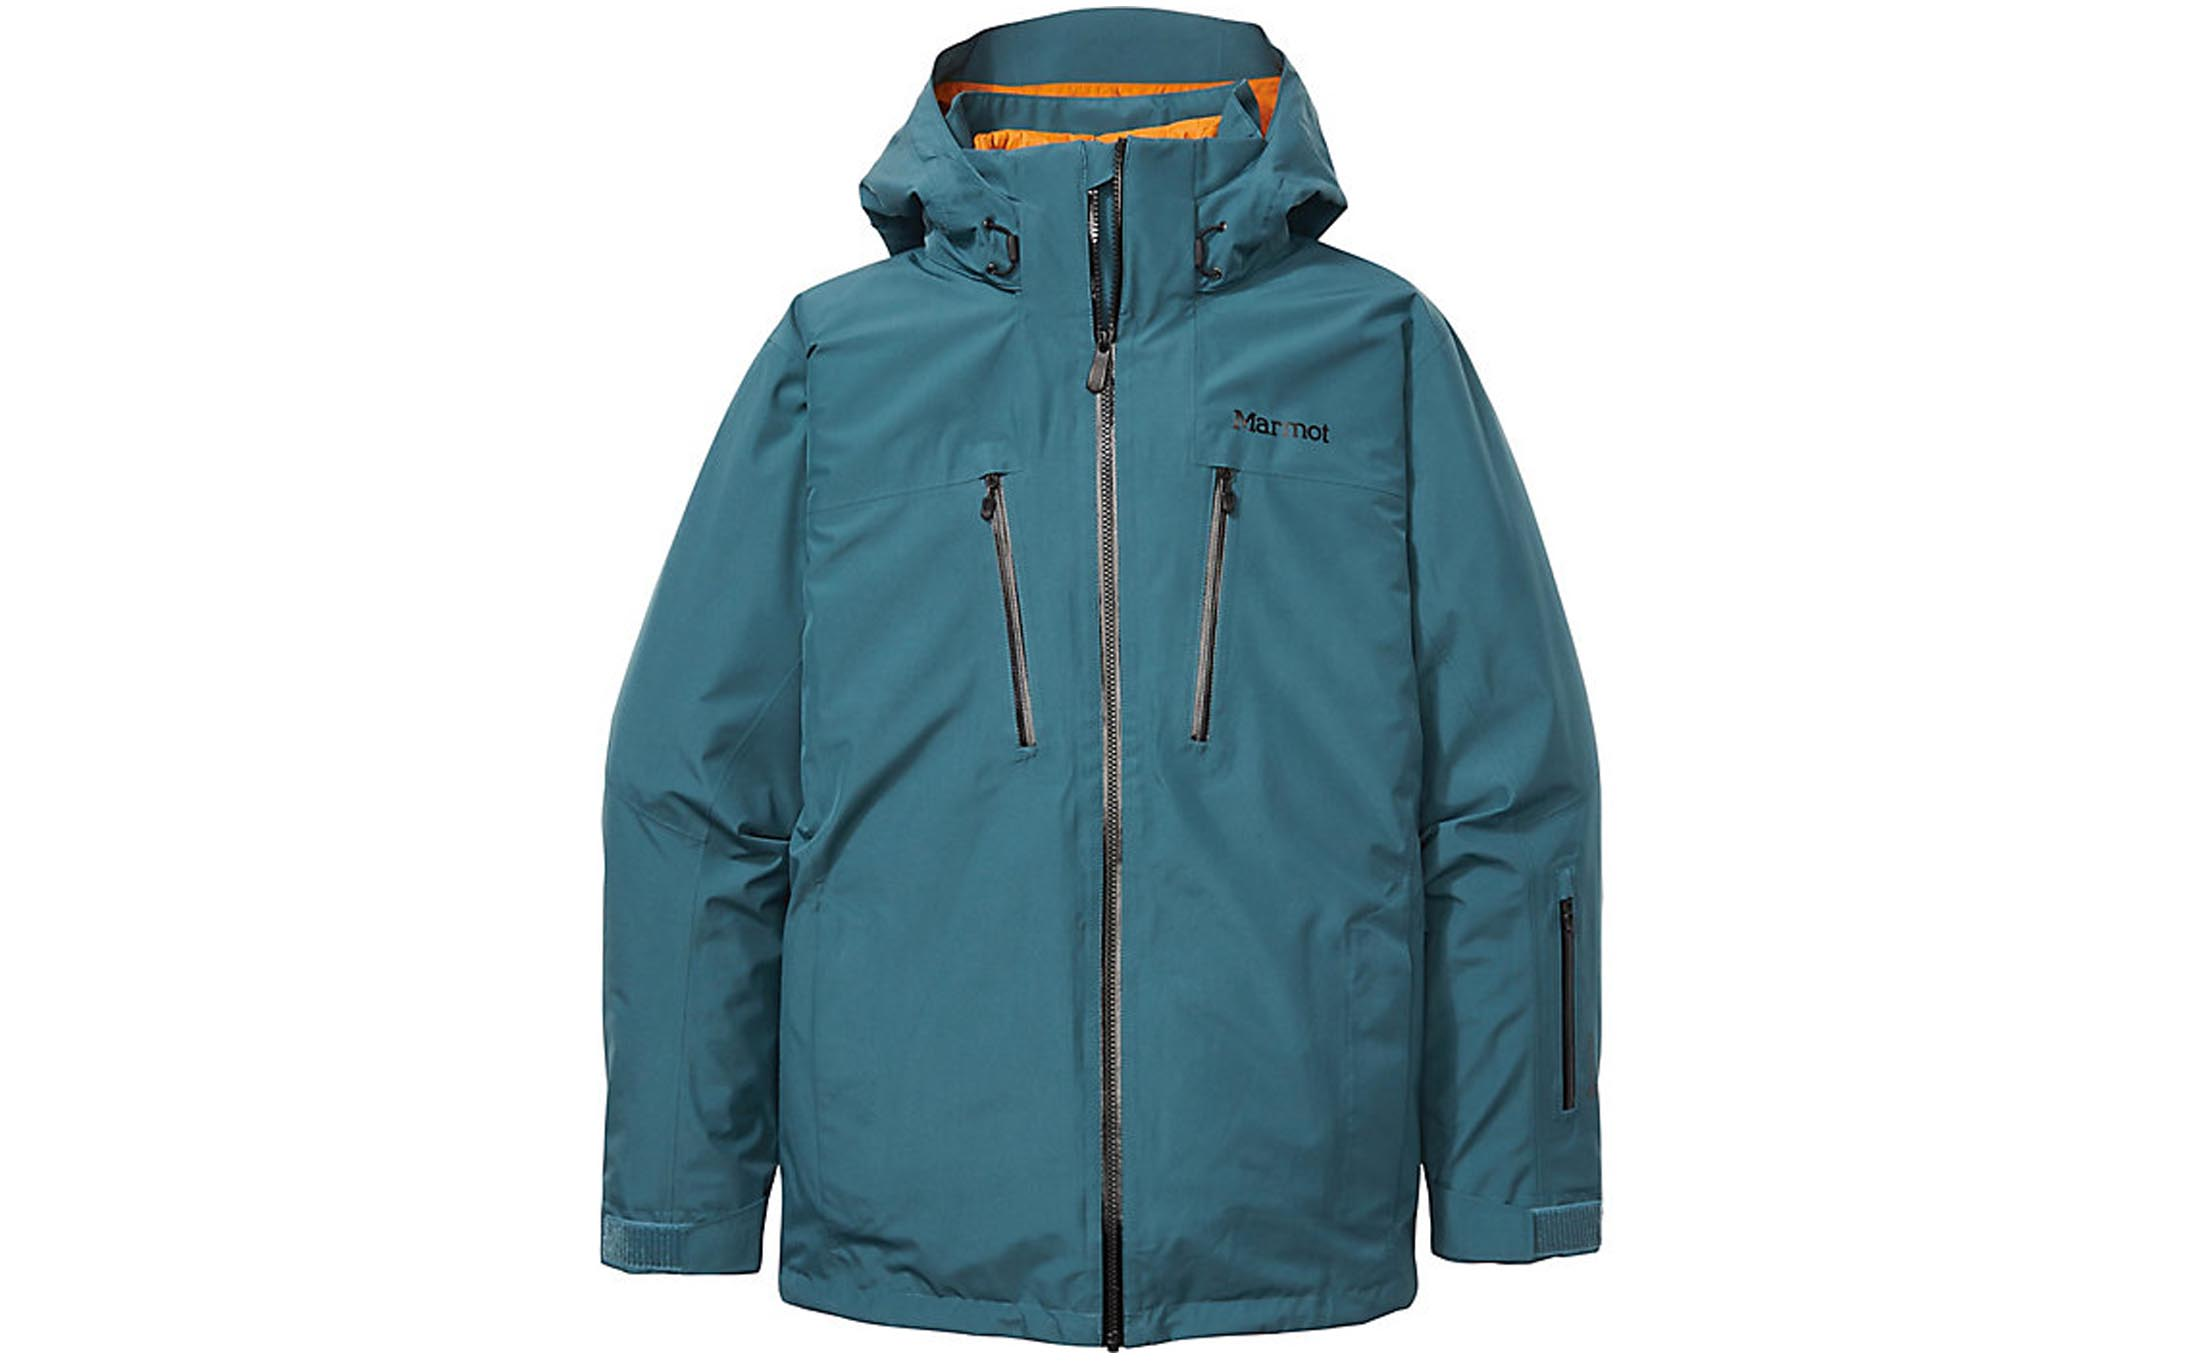 K2 jacket